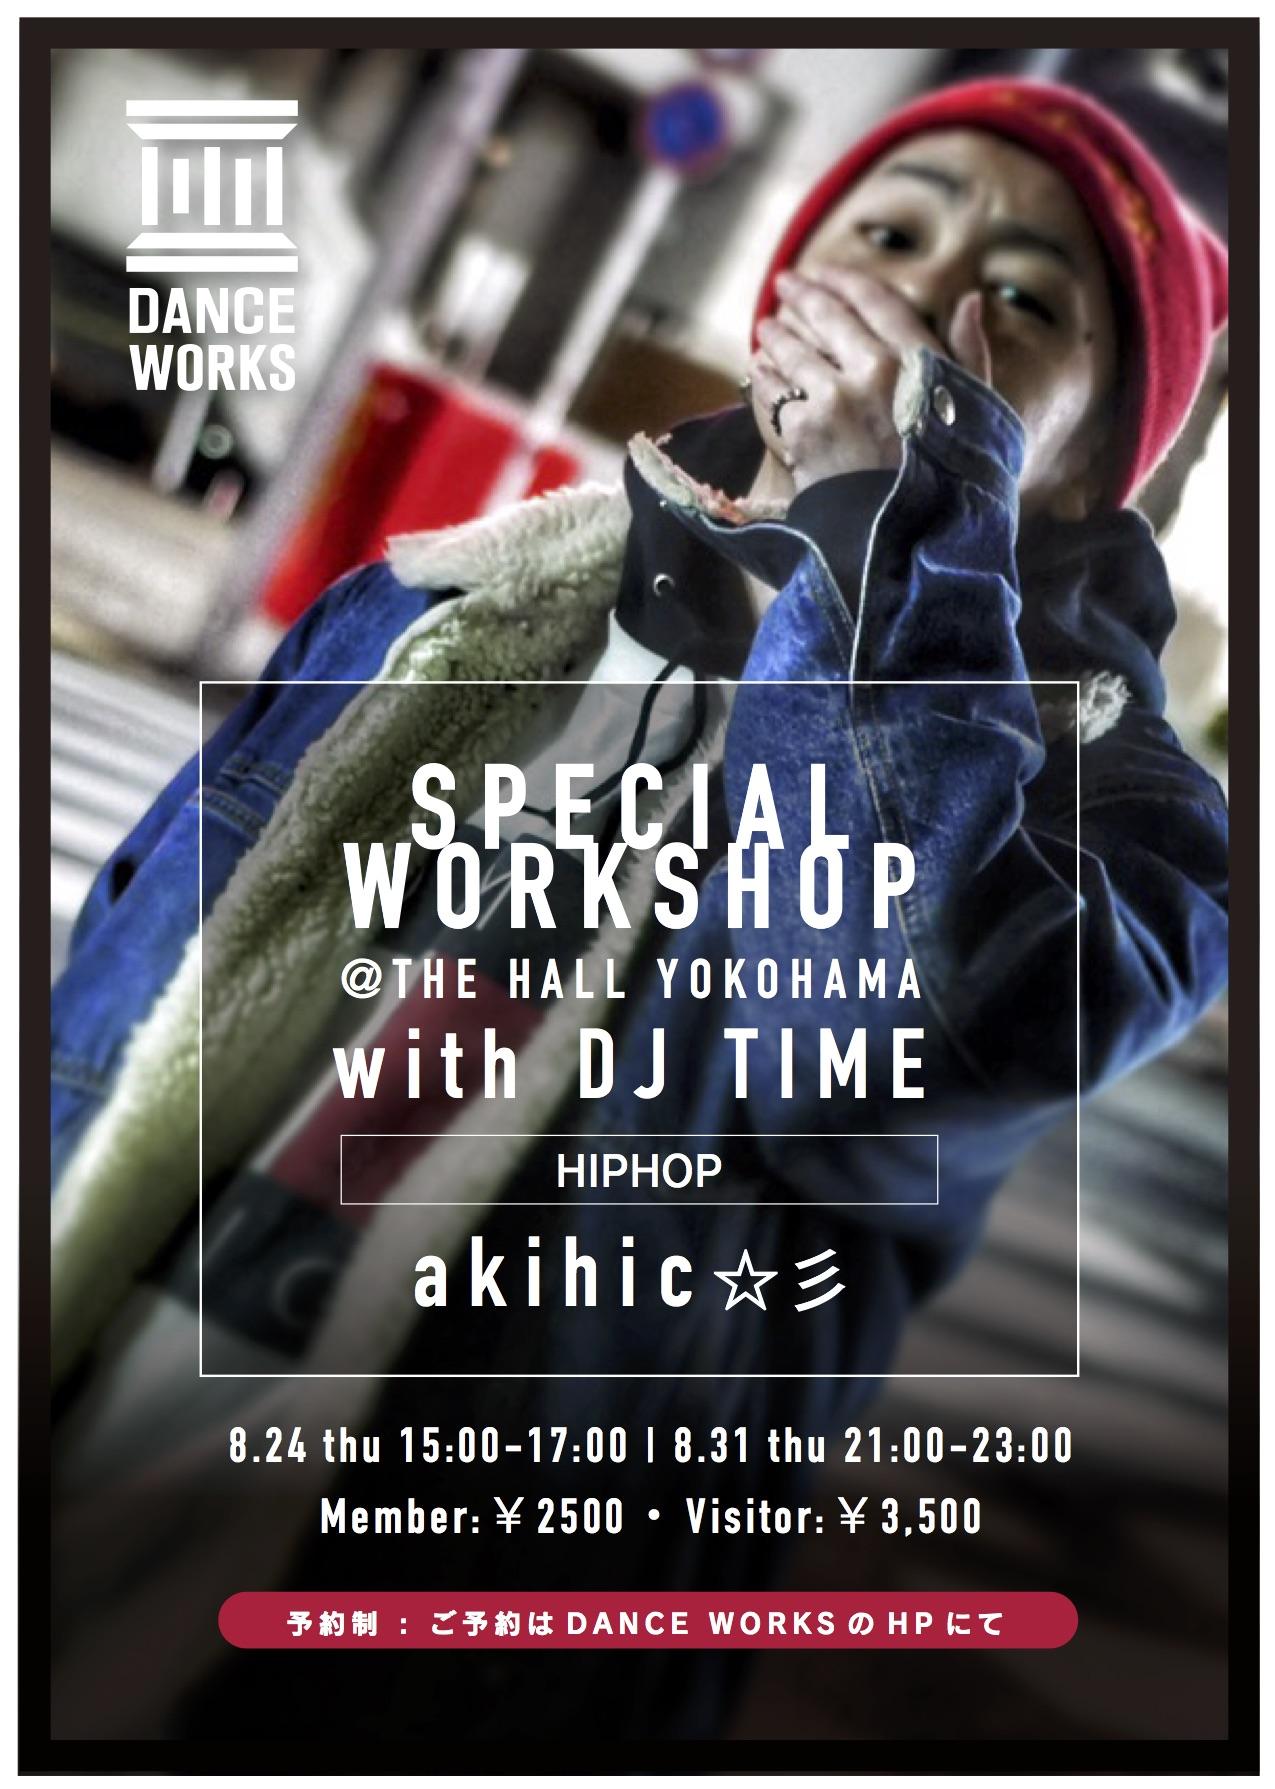 akihic☆彡スペシャルワークショップ!! 〜with DJ TIME〜